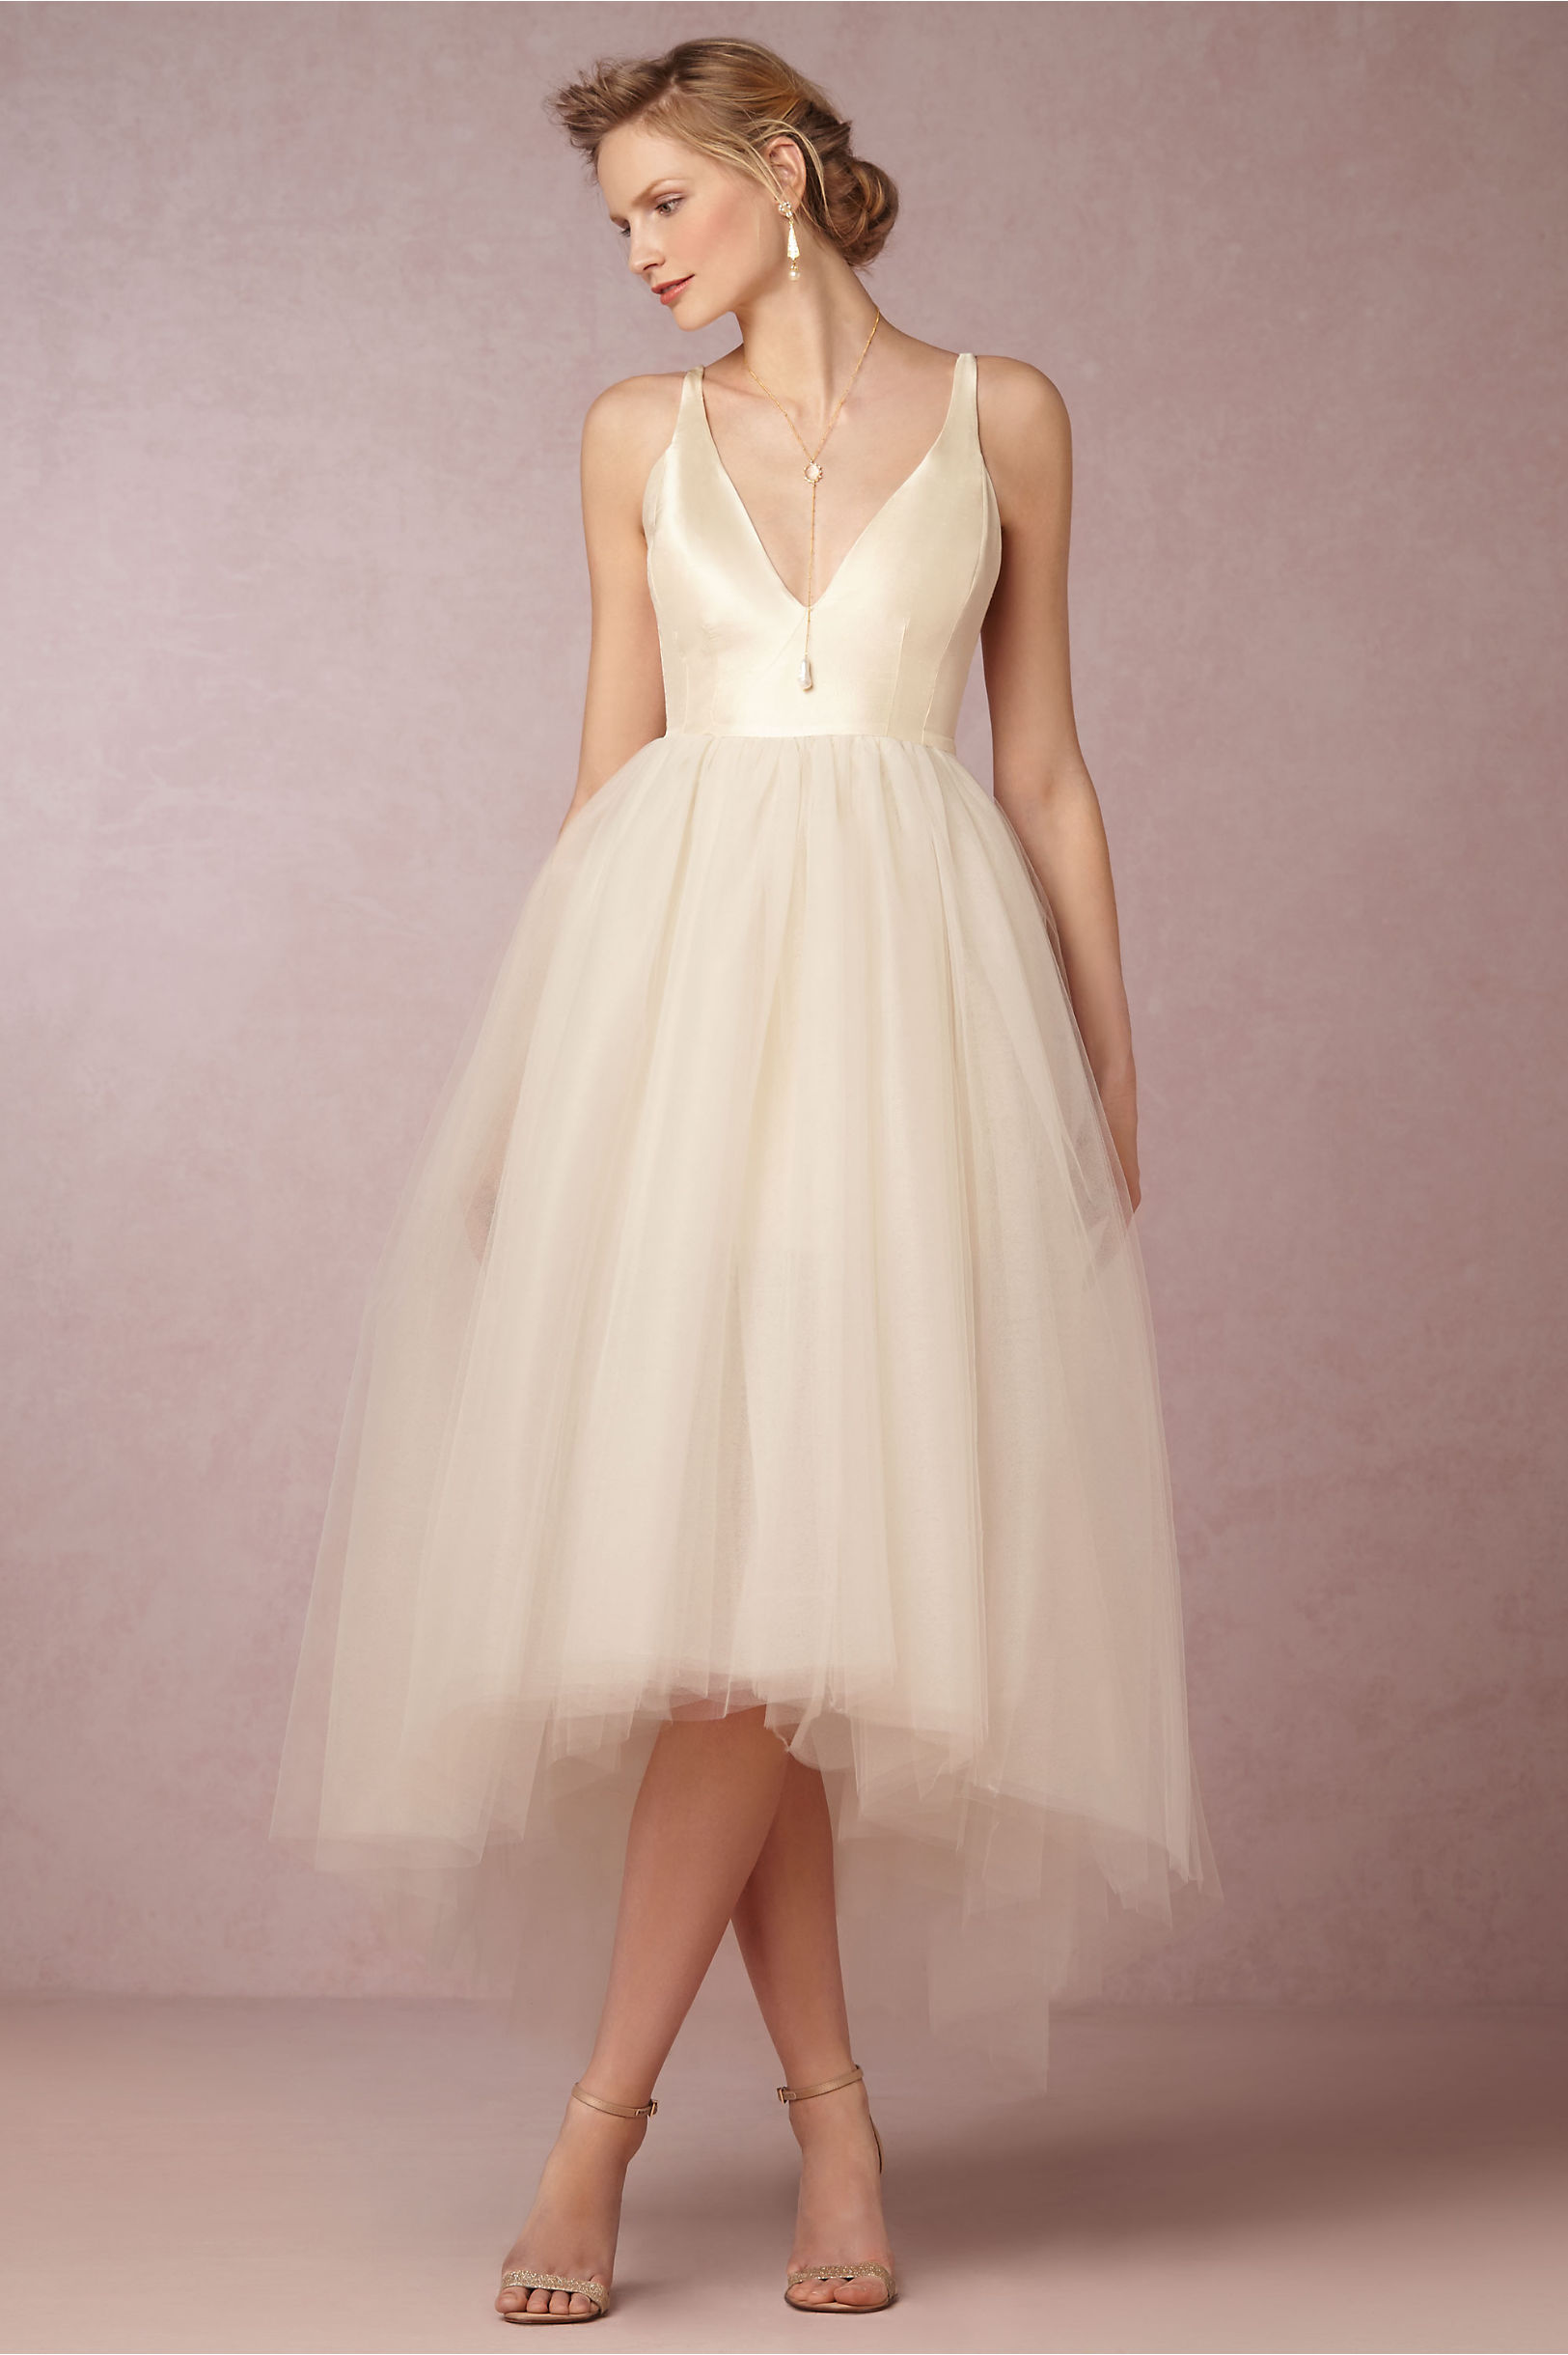 Did You Buy Your Wedding Dress On Ebay